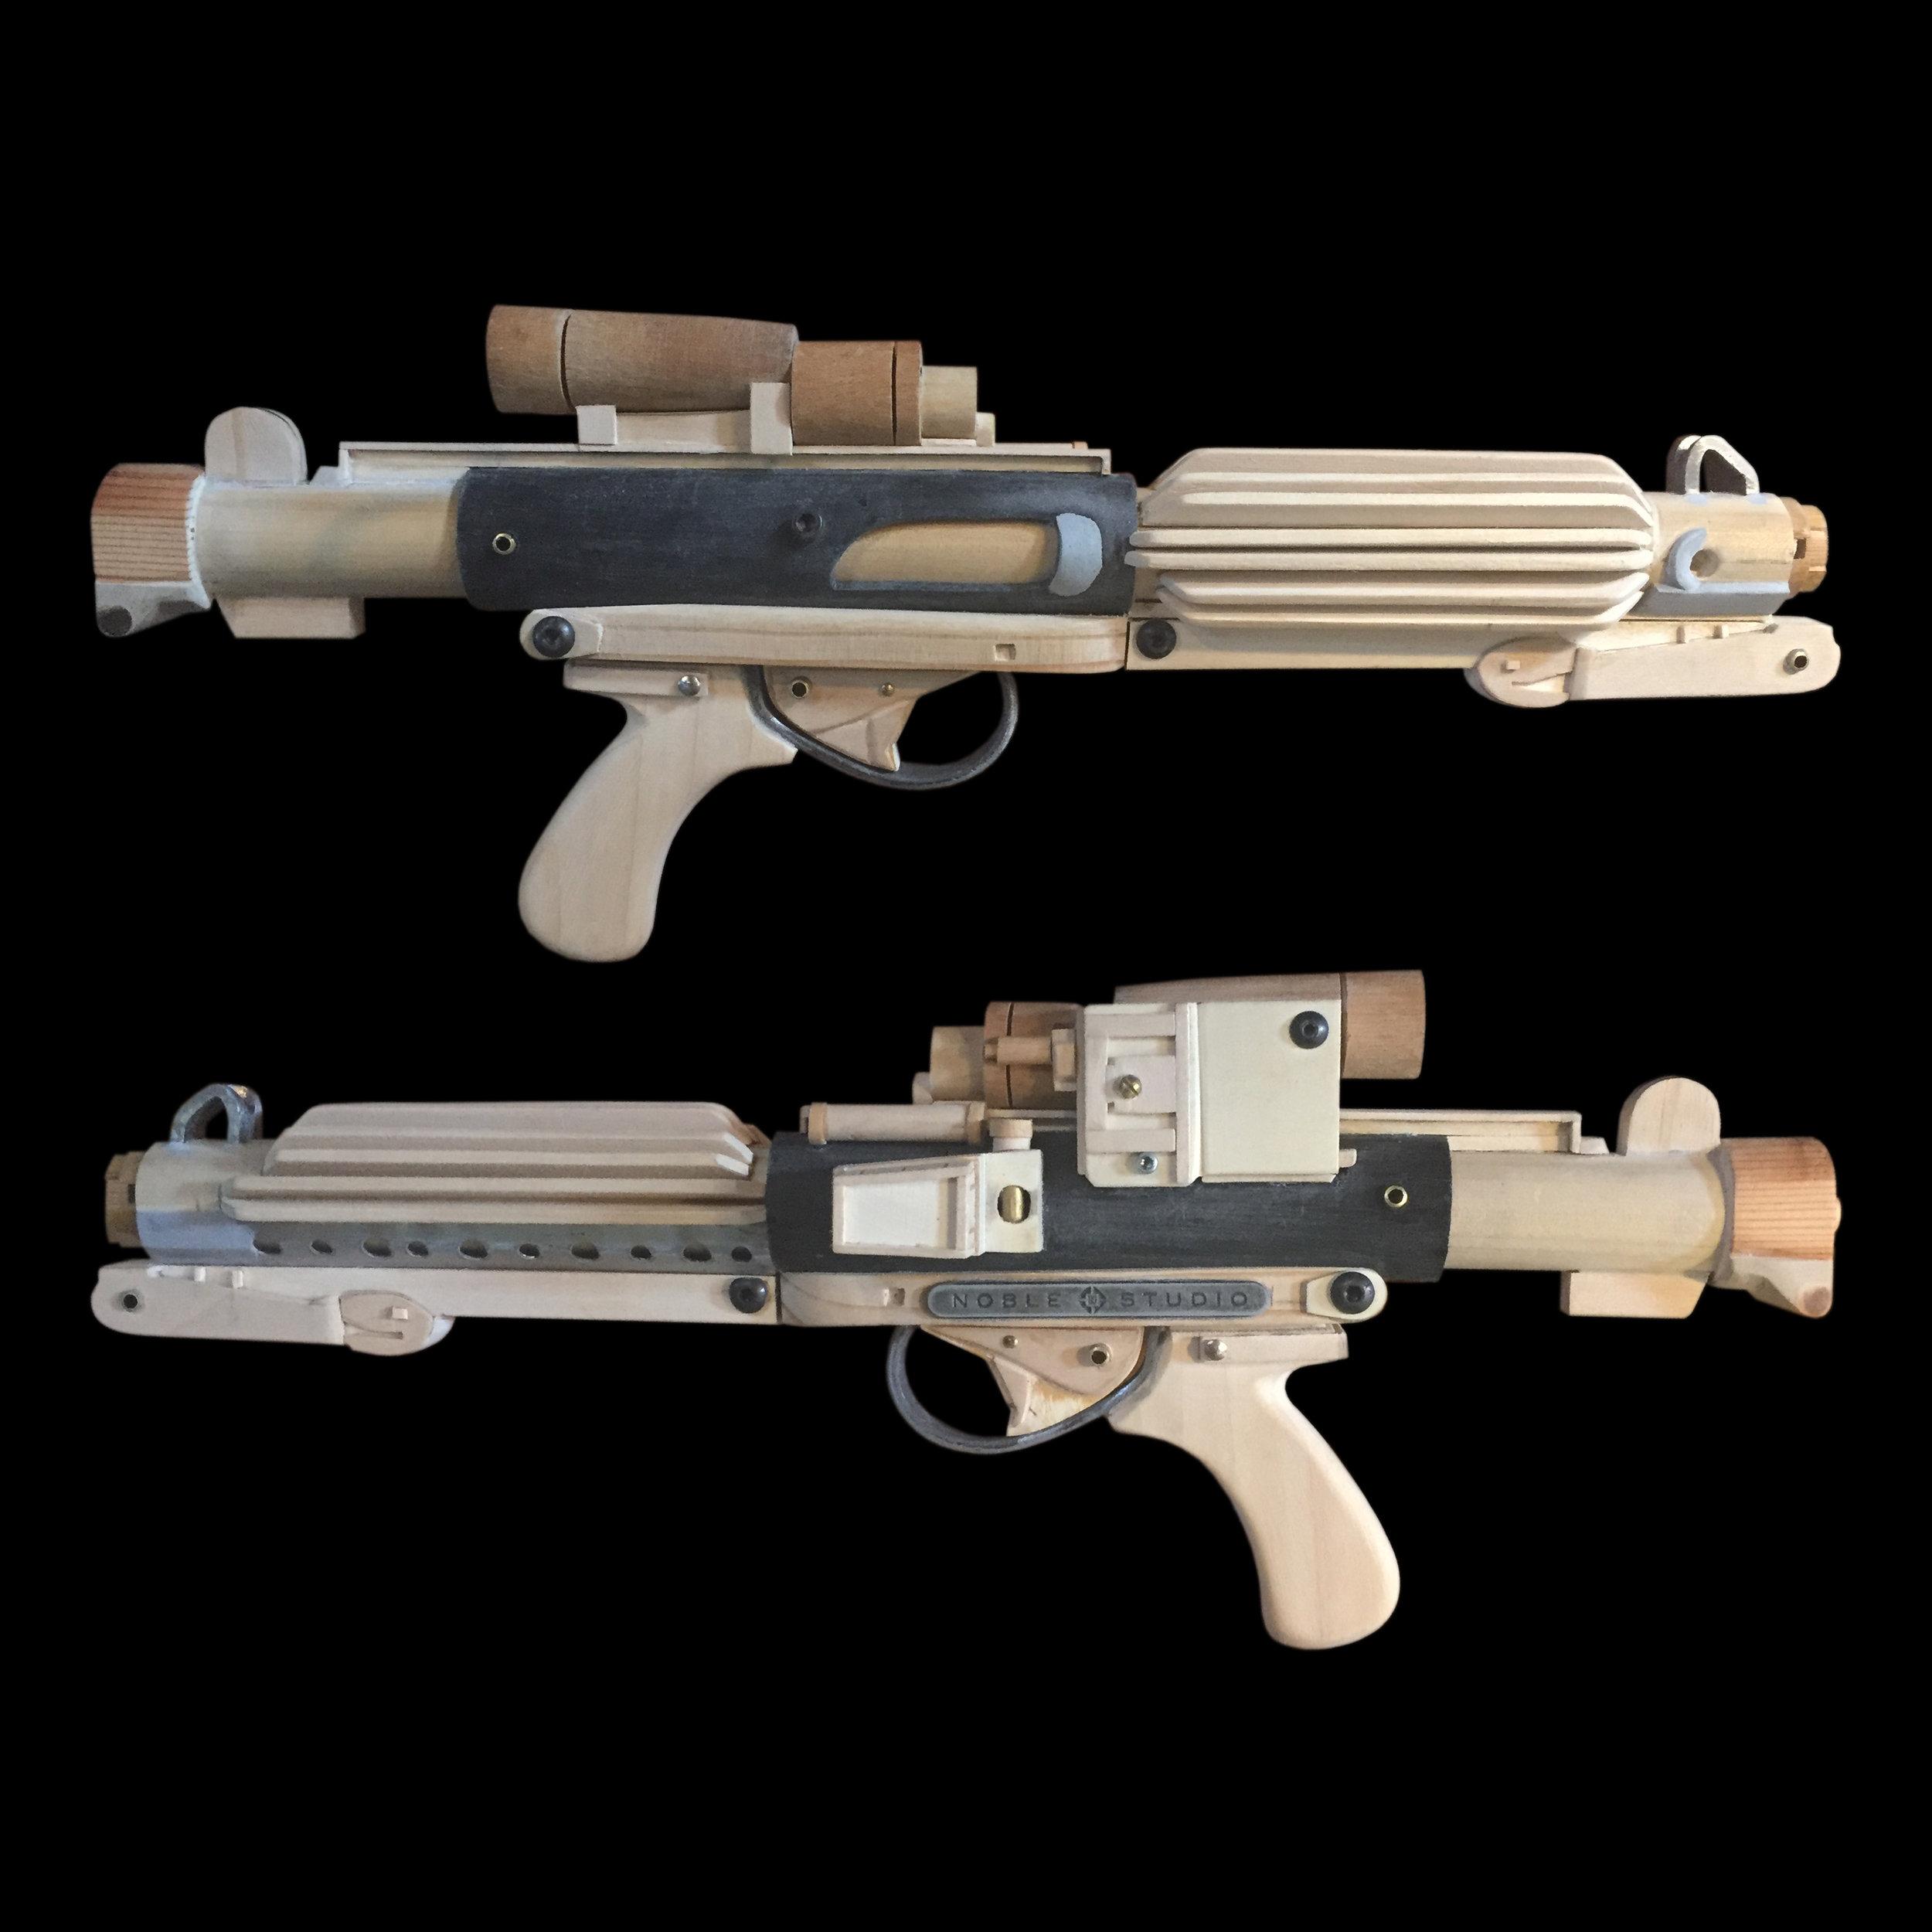 ST-WoodBlaster-1&2-BlkBkgrnd.jpg